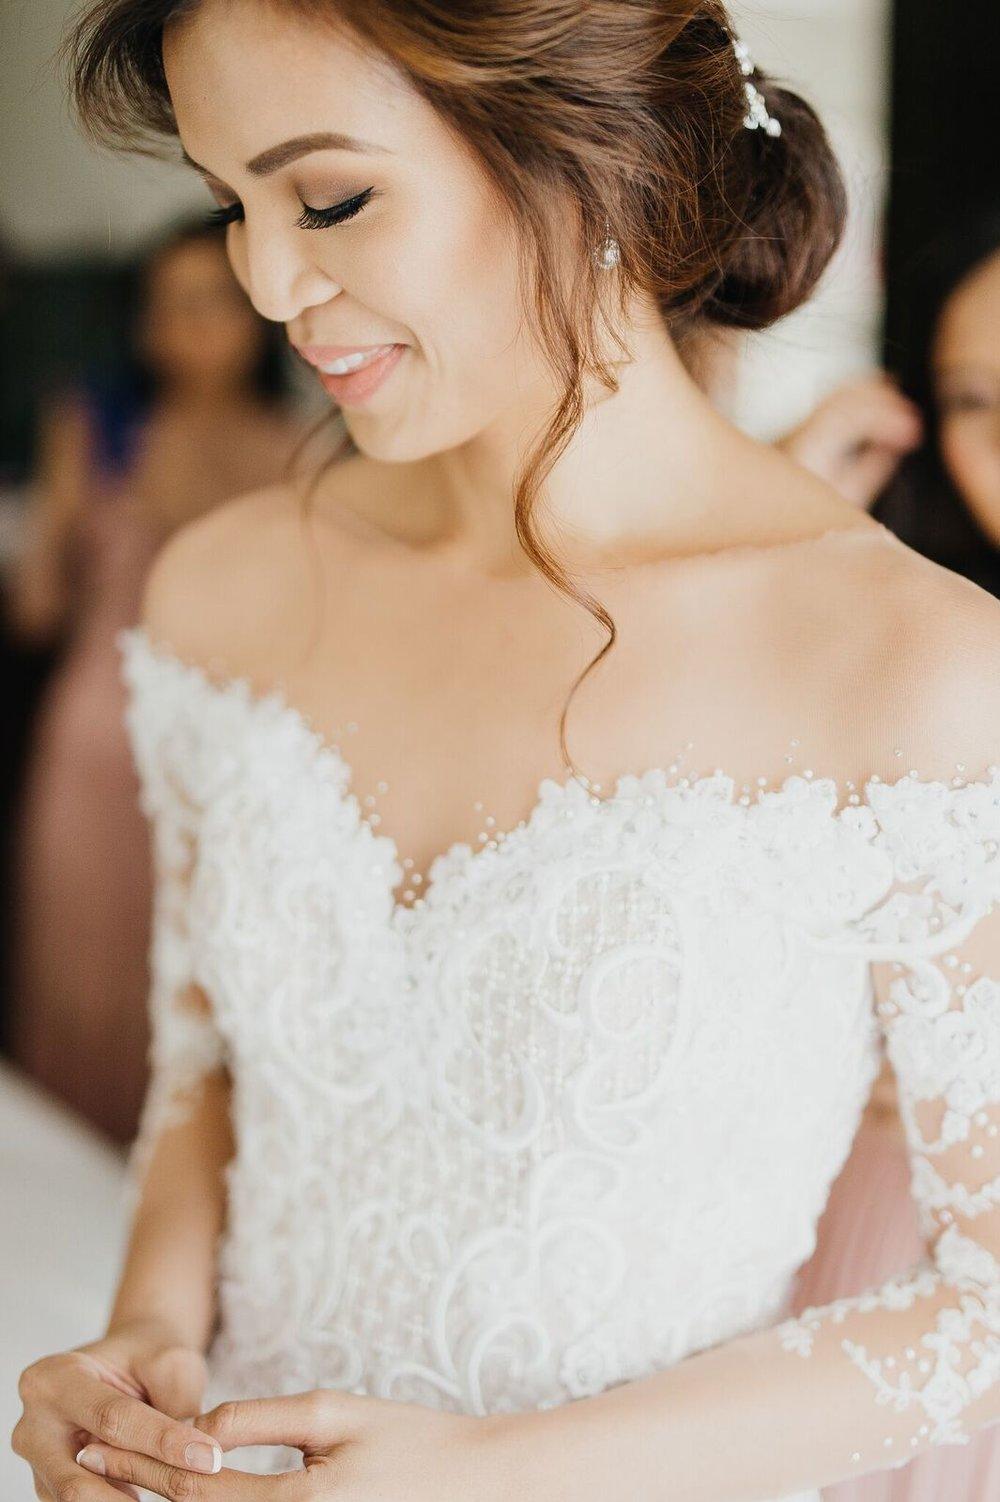 Bride%20Done-52.jpg